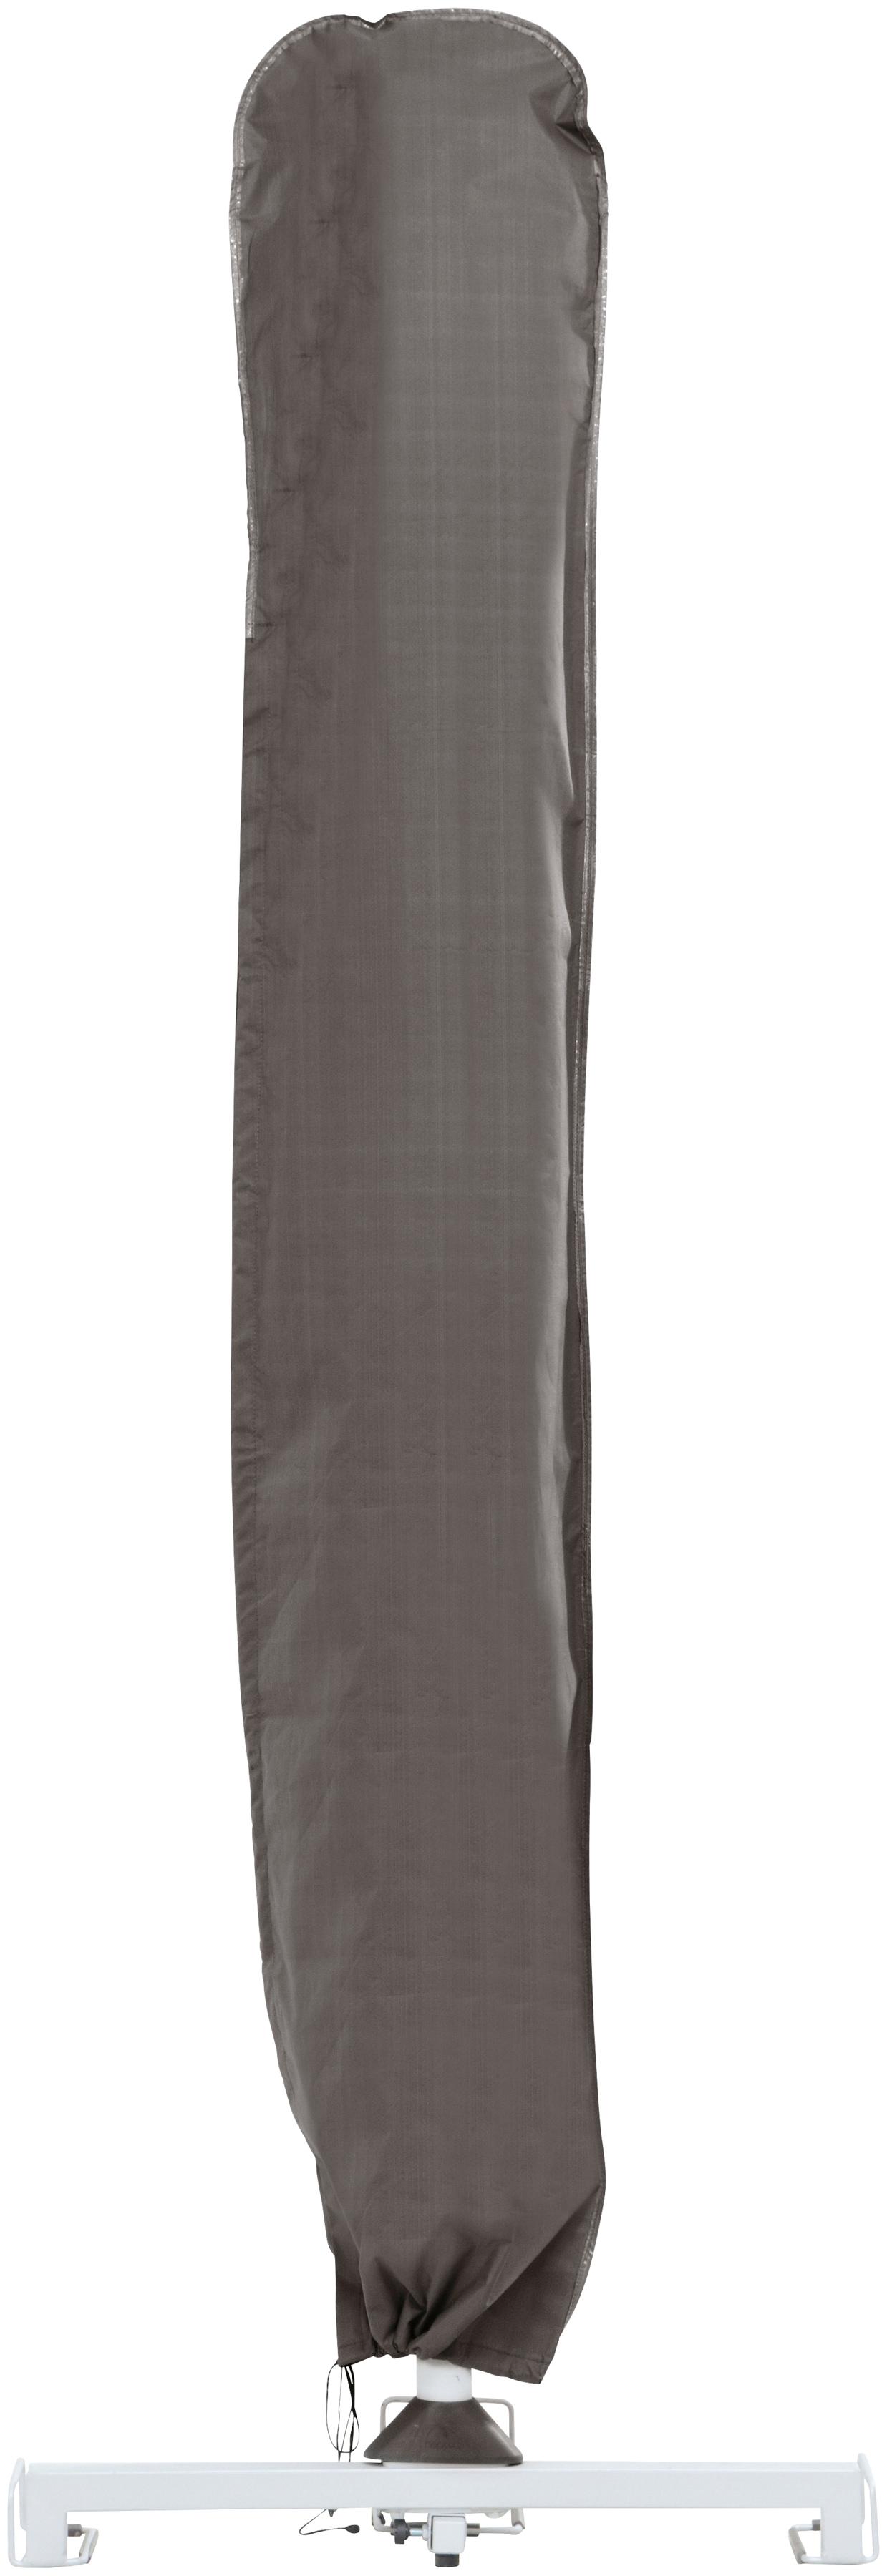 Best Schutzplane, (L/B): ca. 250x64 cm grau Gartenmöbel-Schutzhüllen Gartenmöbel Gartendeko Schutzplane